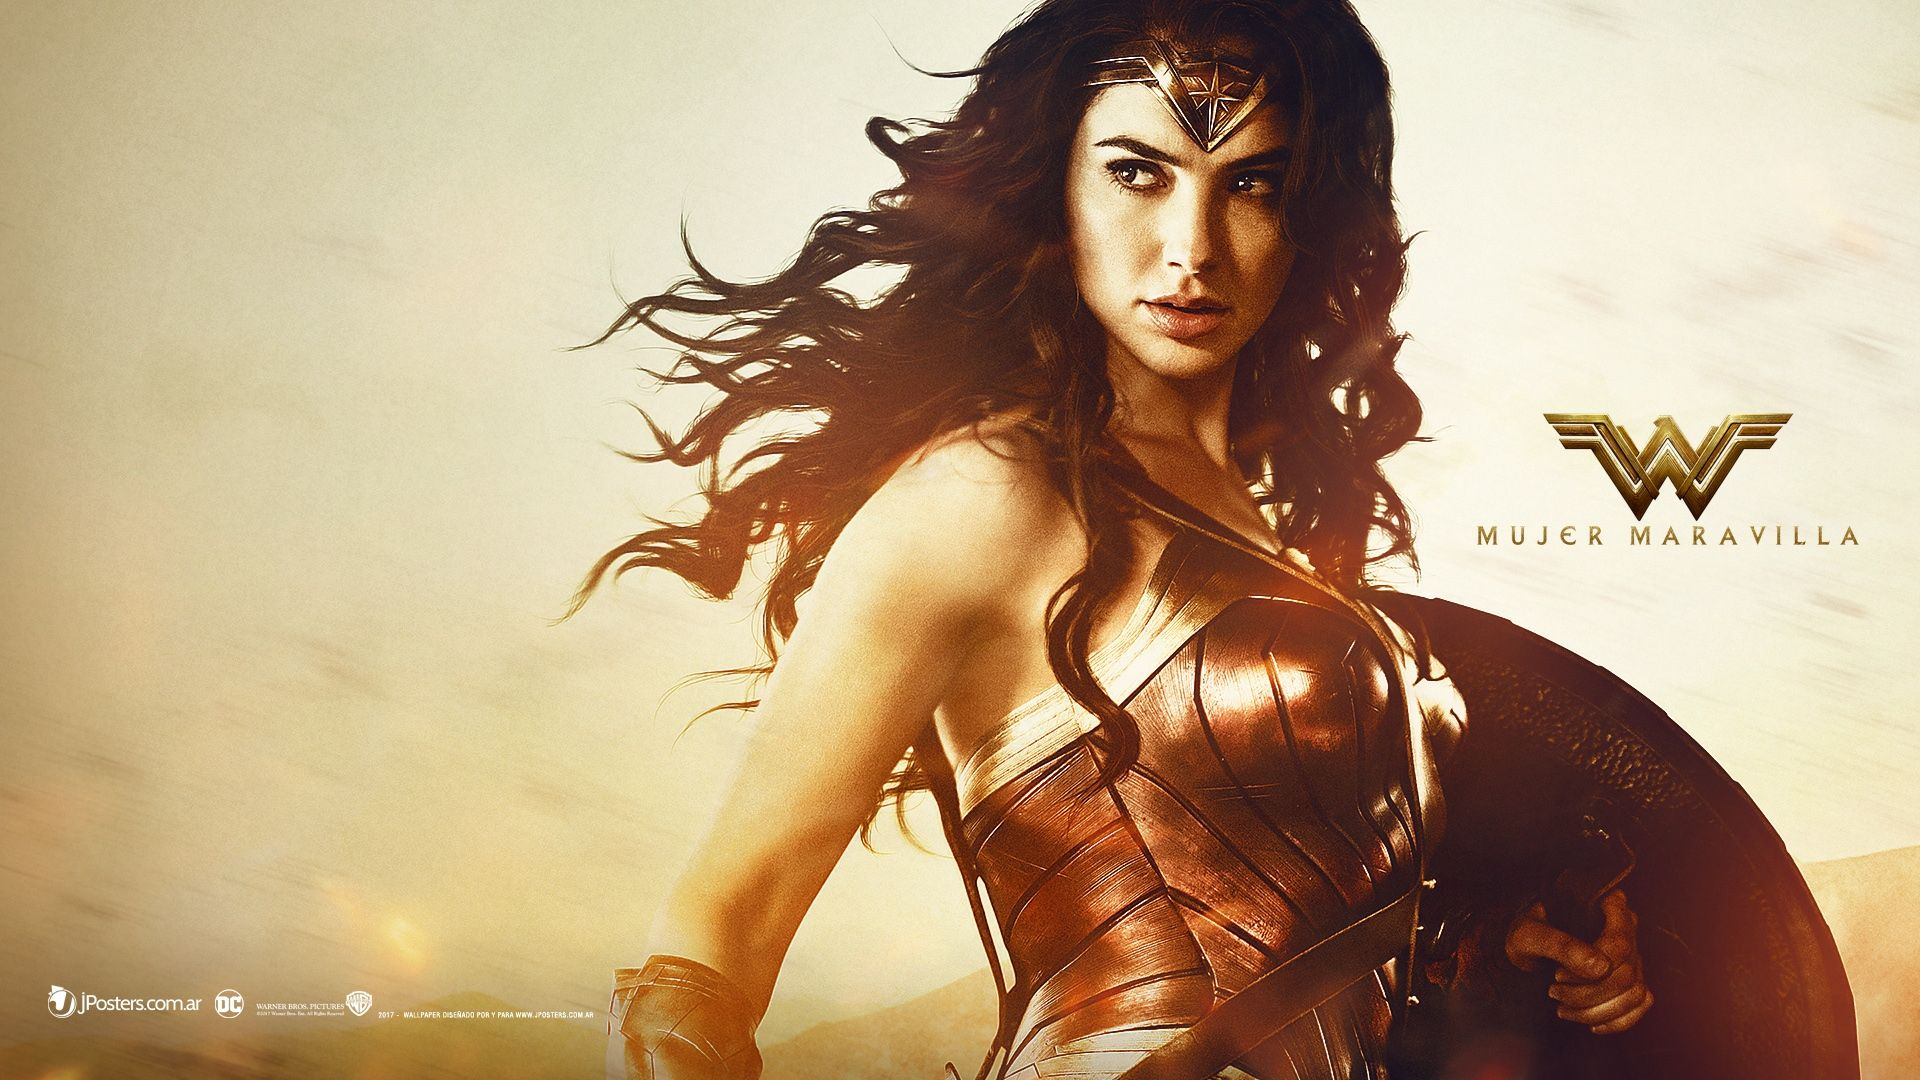 Wonder Woman 7 Movie Wallpapers: Wonder Woman 2017 Diana Prince (Gal Gadot) DC Movie